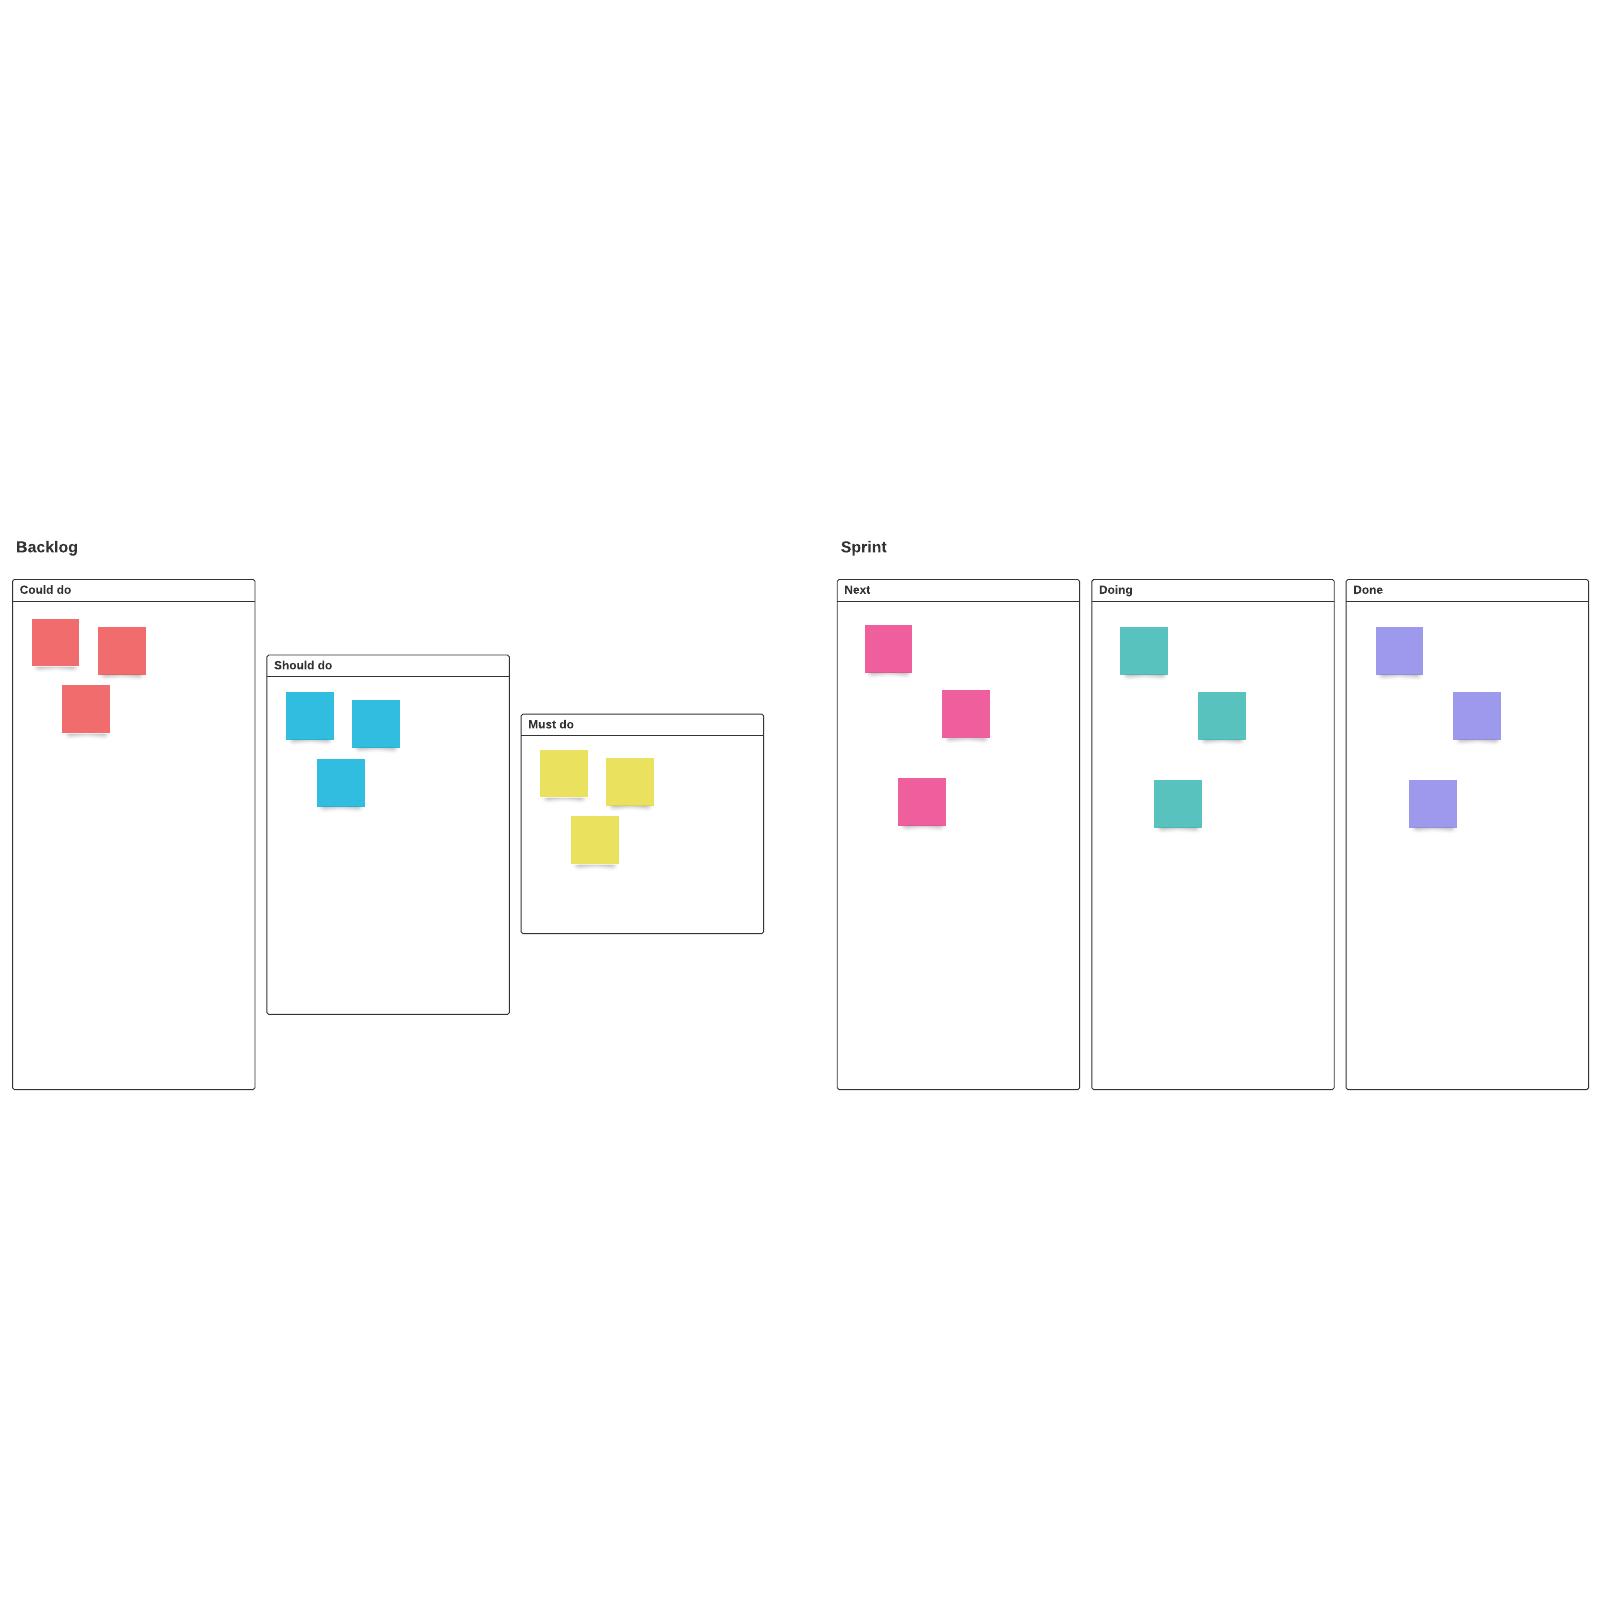 Idea funnel backlog template